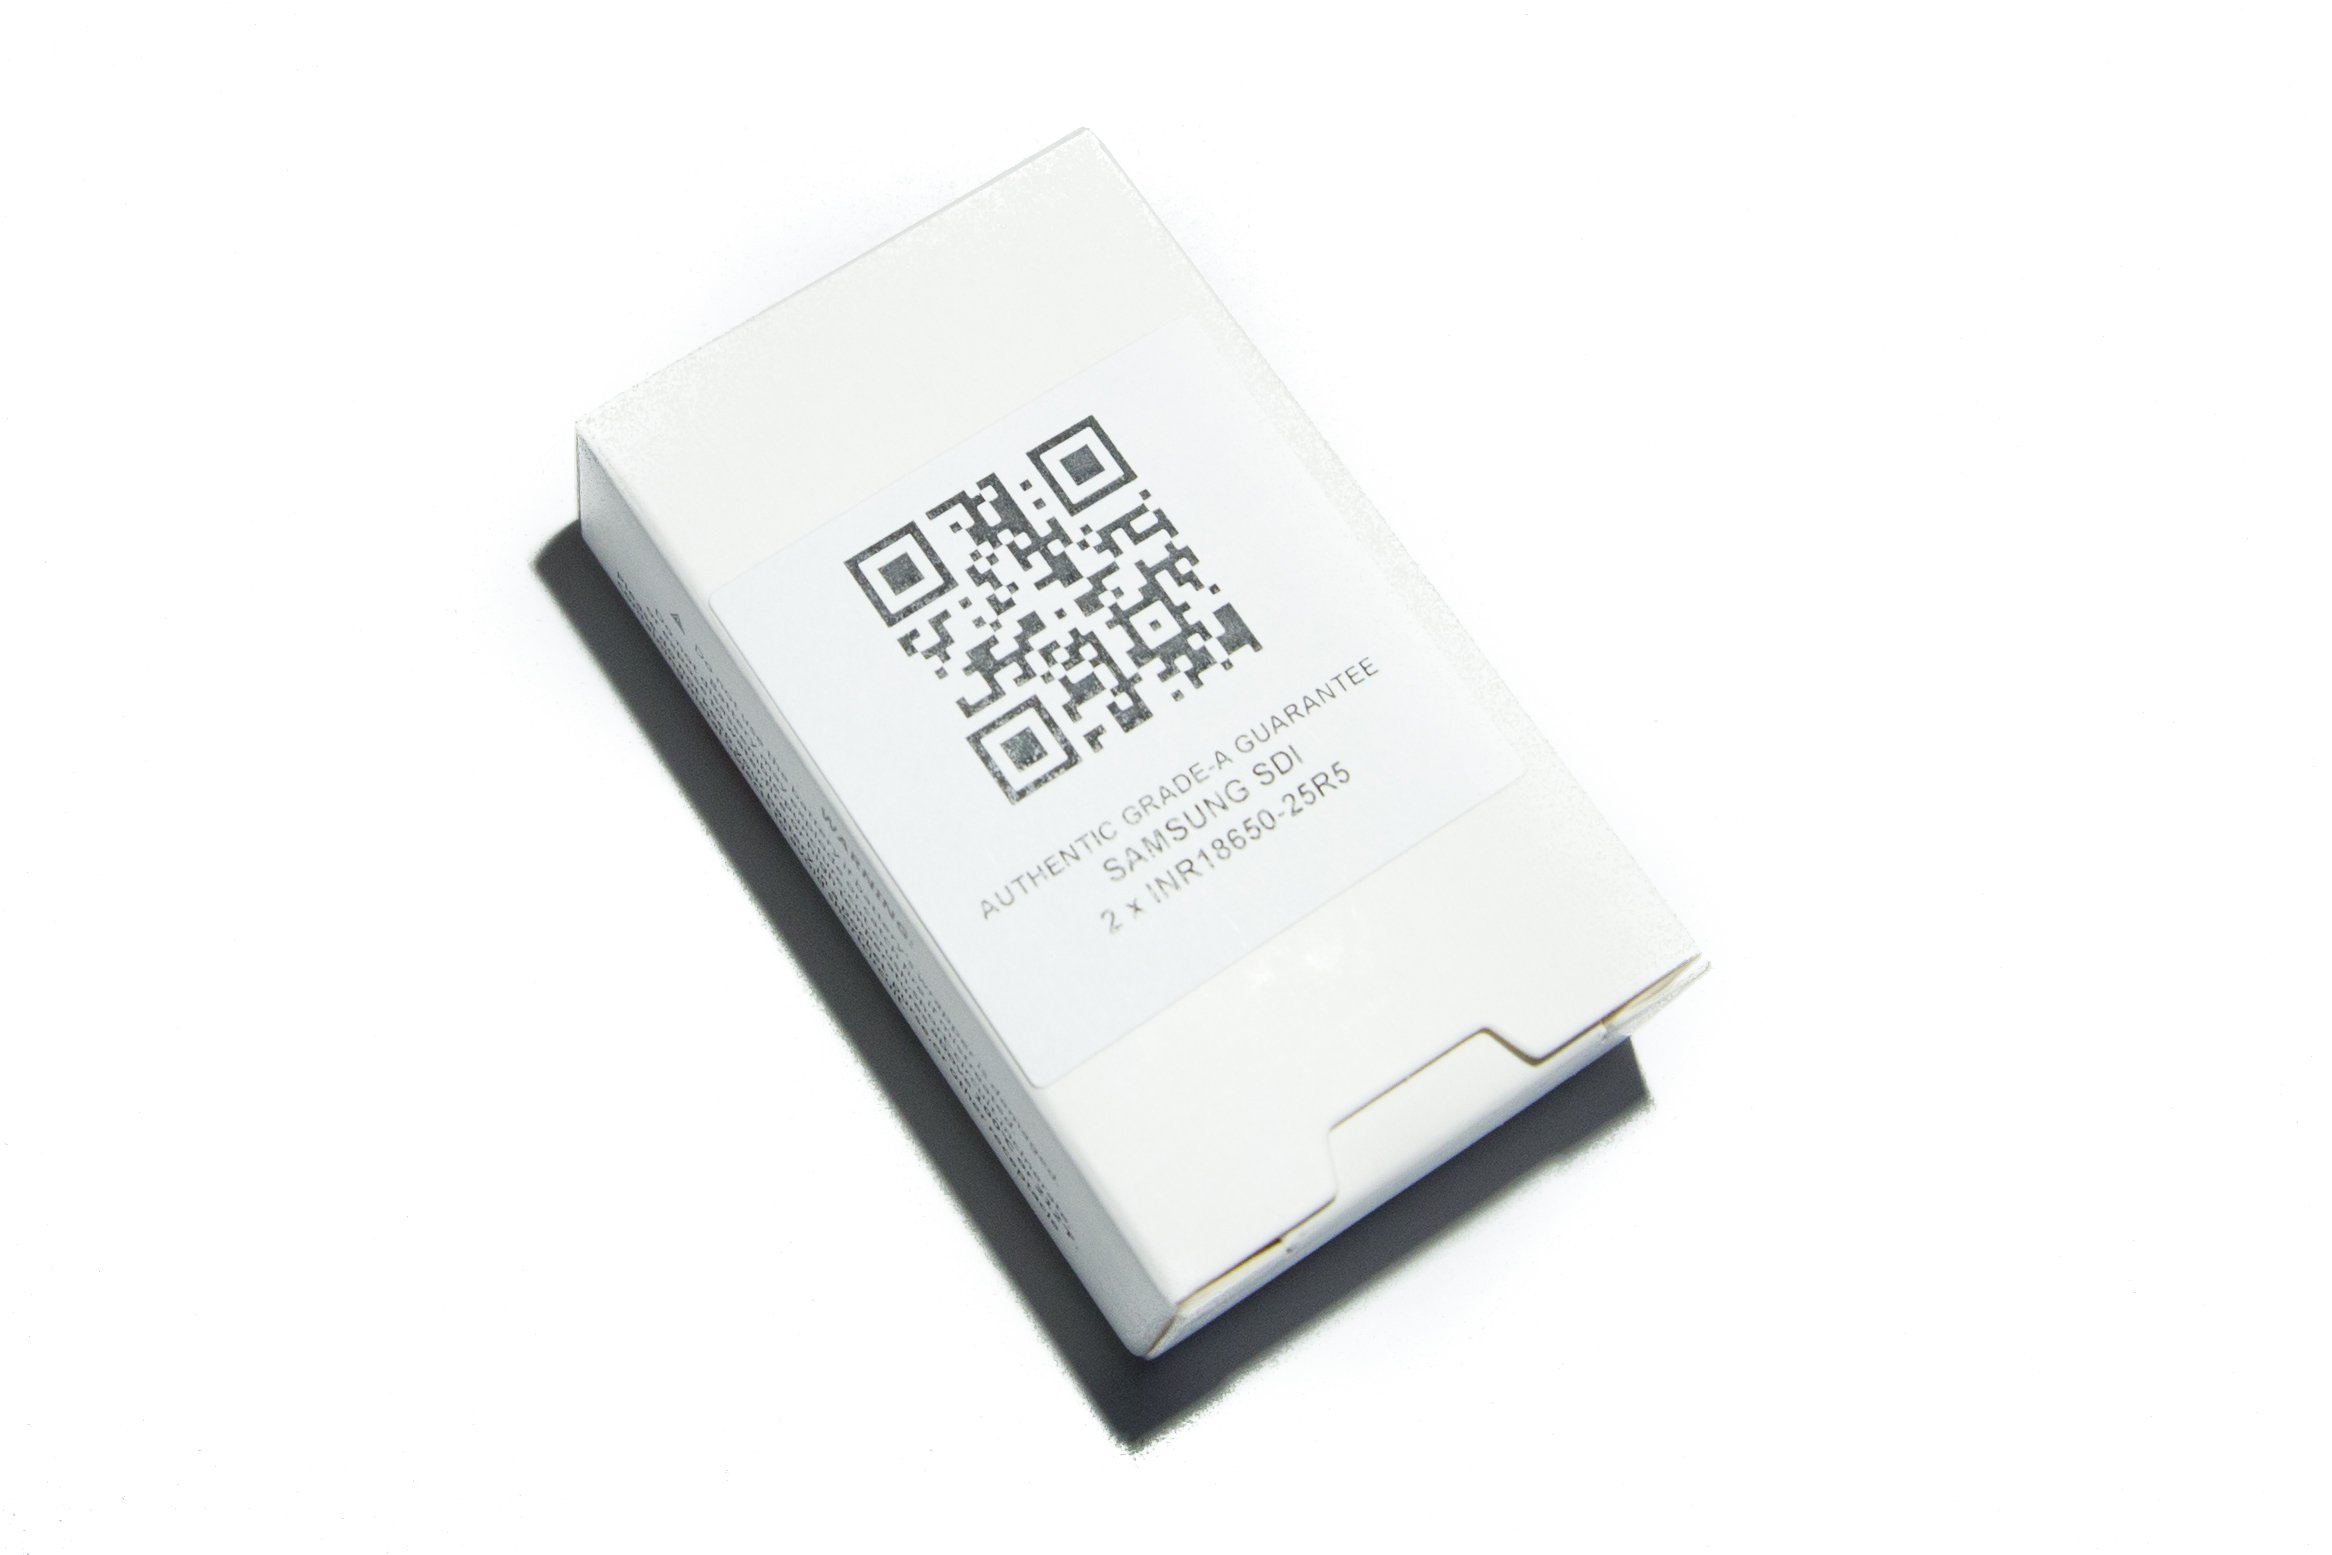 2pcs Samsung INR18650-25R 18650 2500mAh 3.7v Li-ion 20A discharge Authentic Grade-A Guarantee by CTINAW HOBBY (Image #9)